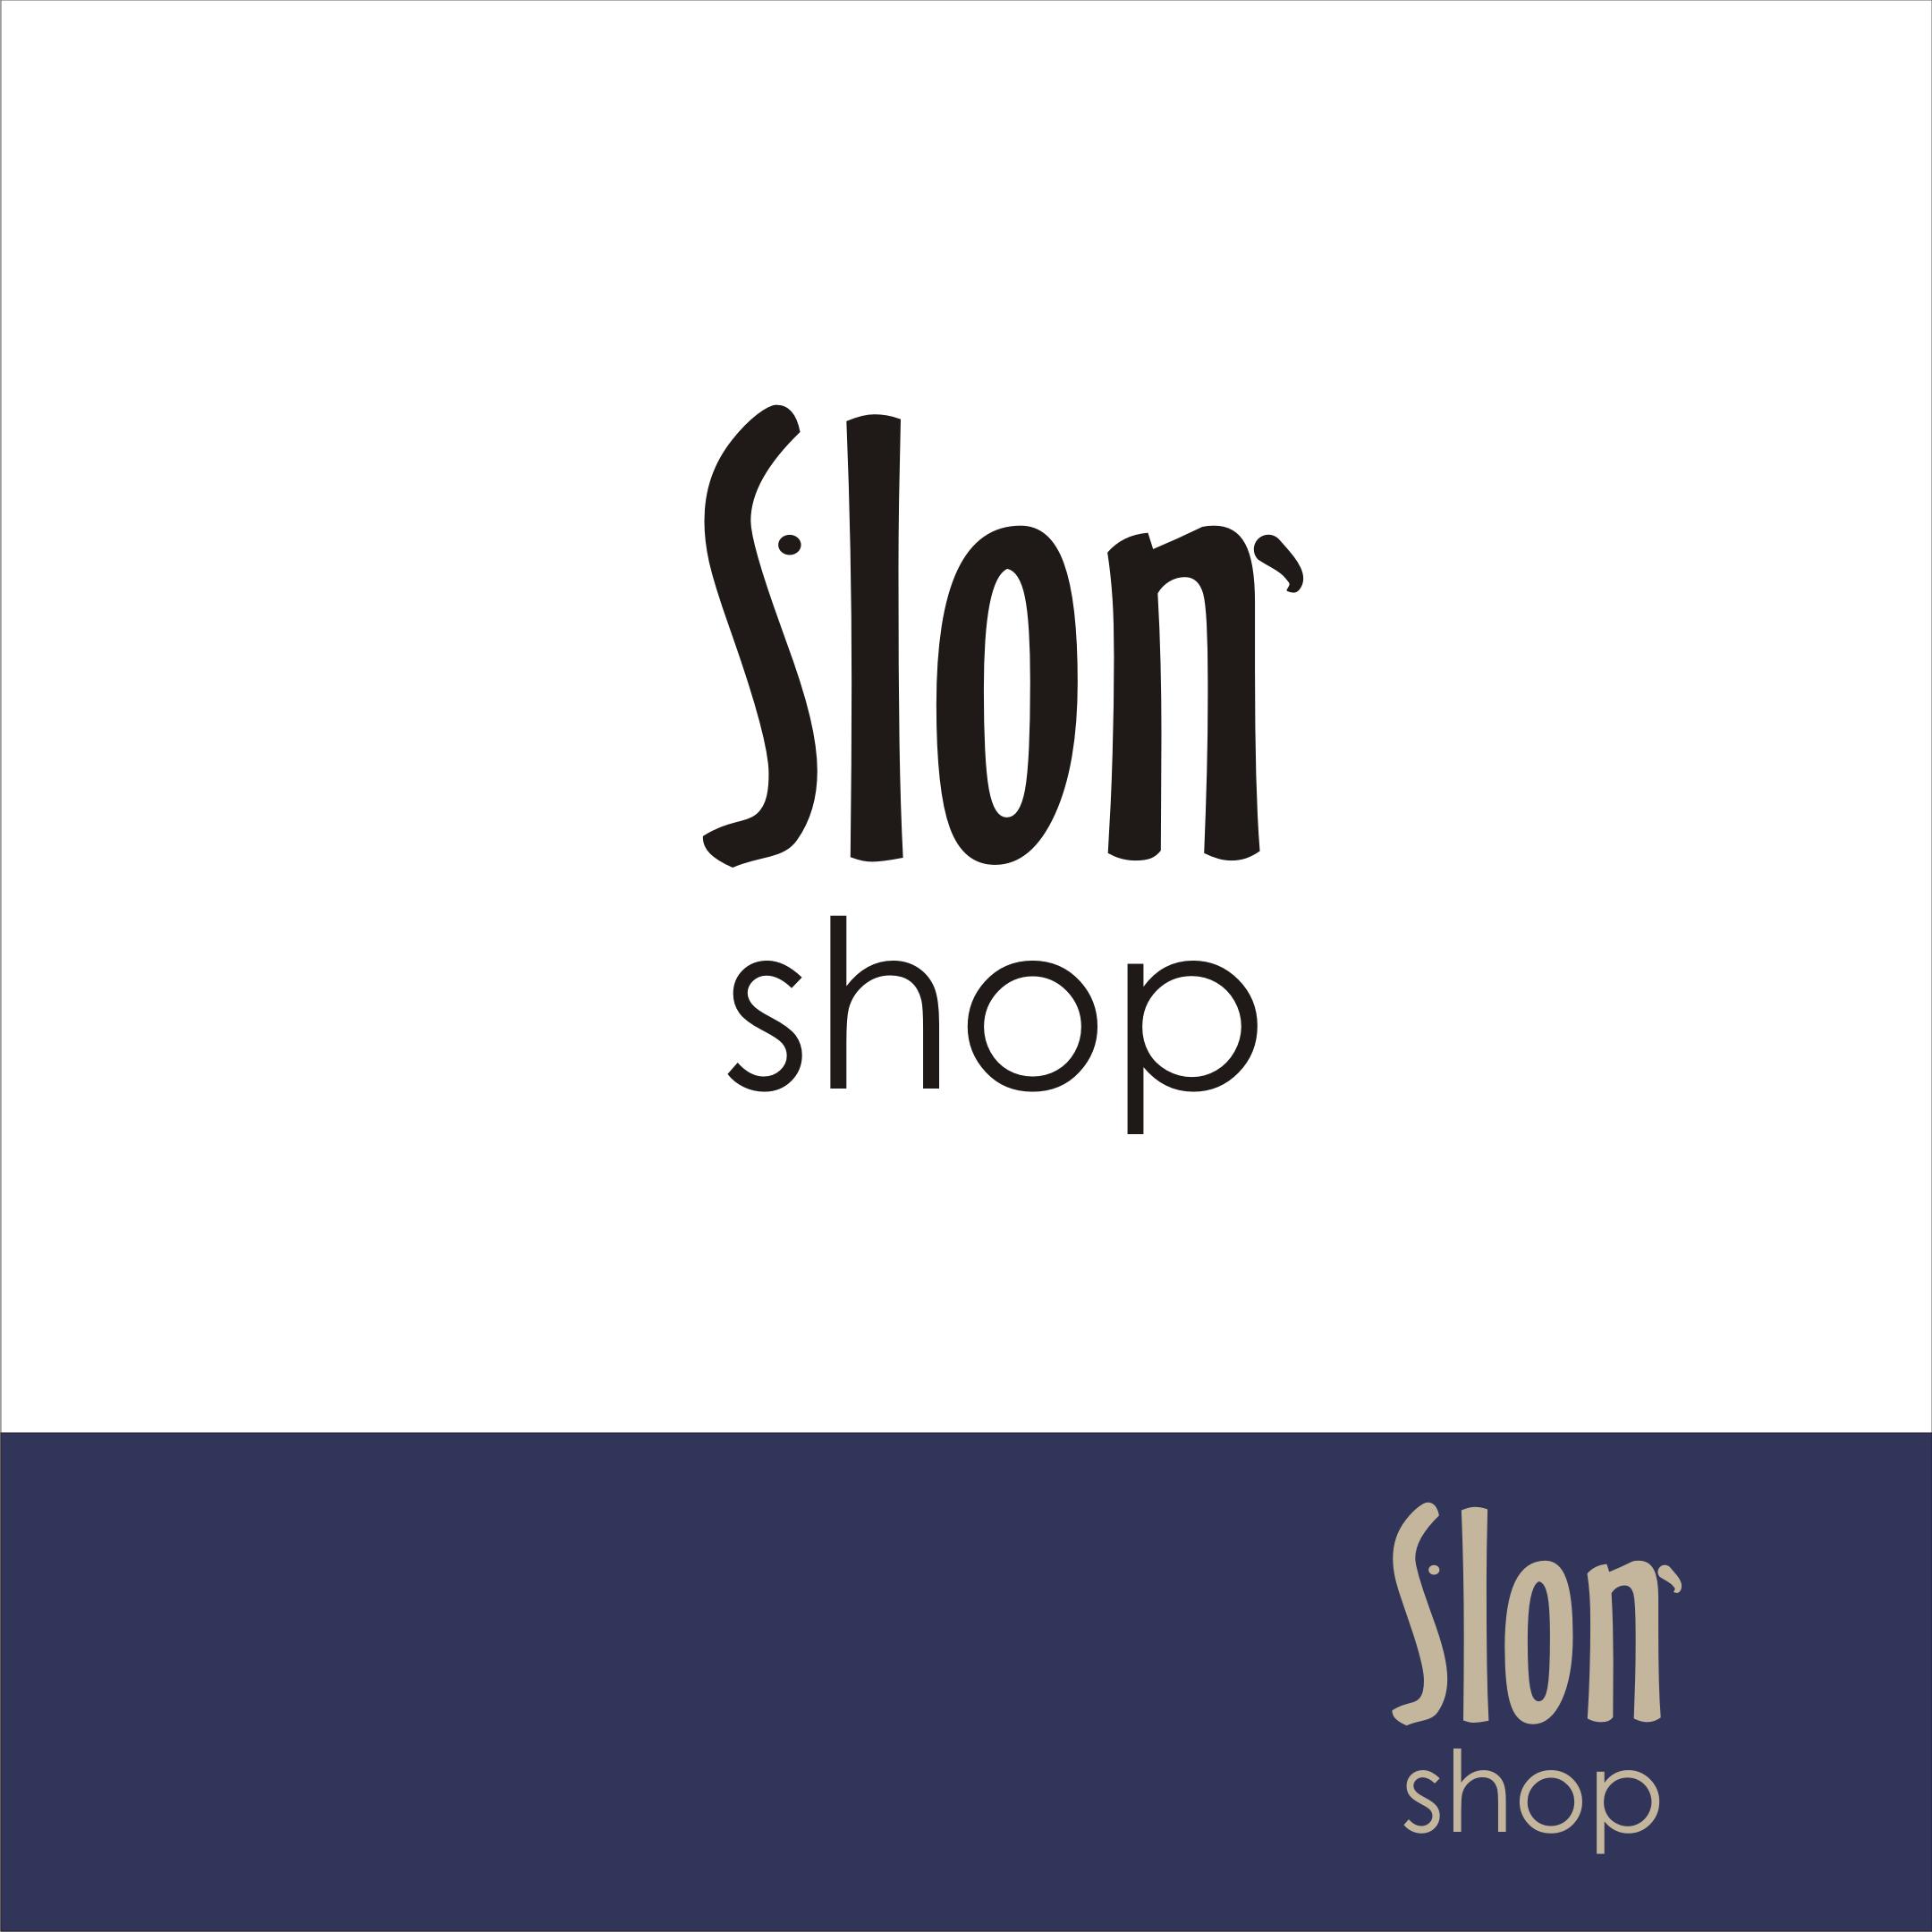 Разработать логотип и фирменный стиль интернет-магазина  фото f_643598c0710549f0.png